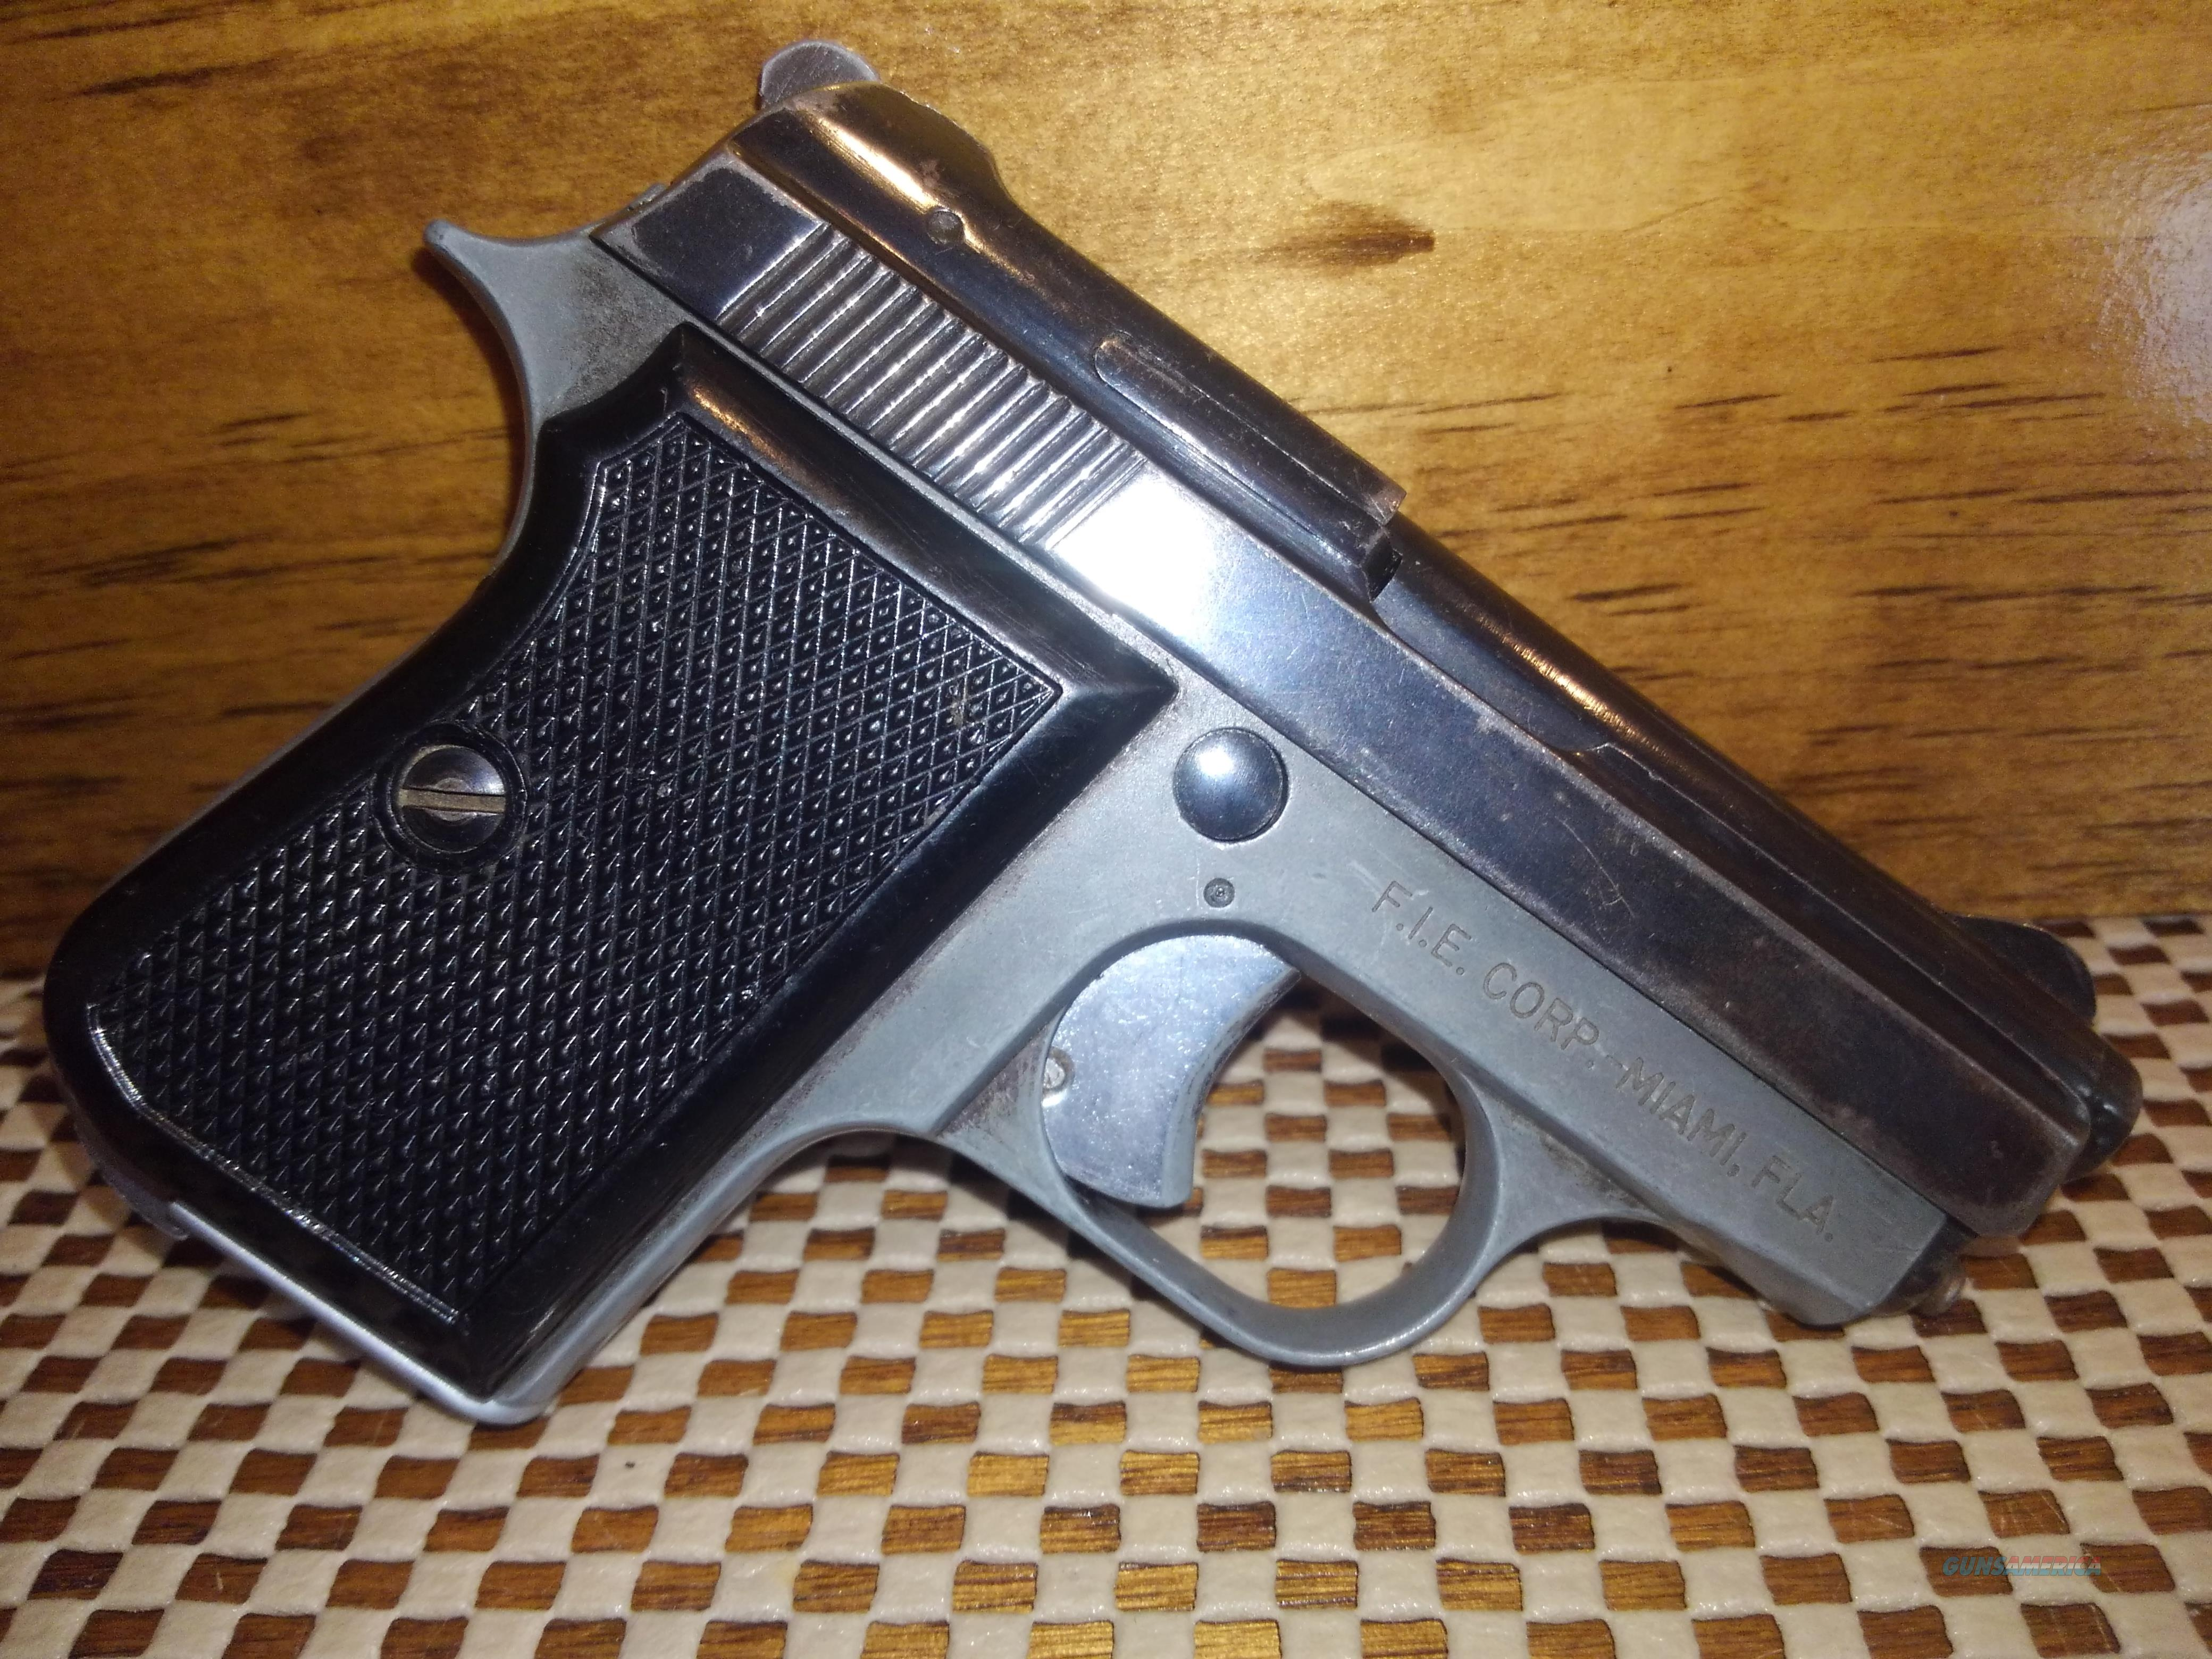 FIE TITAN 25ACP SAO 1-6RD MAG, FREE SHIPPING NO CC FEE  Guns > Pistols > FIE Pistols